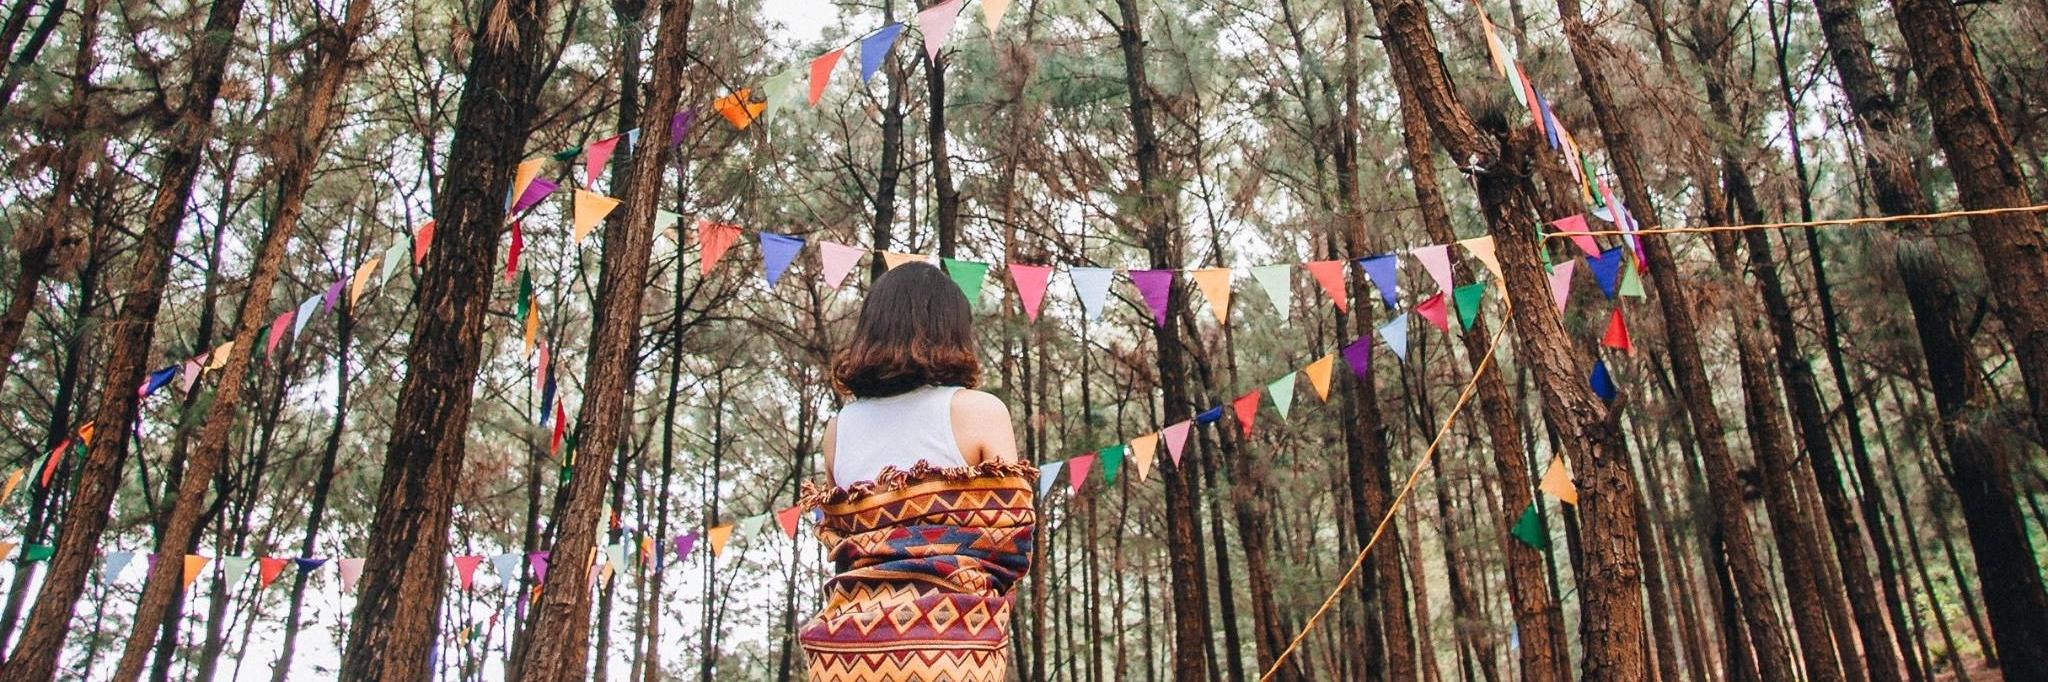 https://gody.vn/blog/thanhmai4171/post/cuoi-tuan-roi-keo-be-keo-phai-di-picnic-o-ban-rom-soc-son-ha-noi-thoi-nao-4045